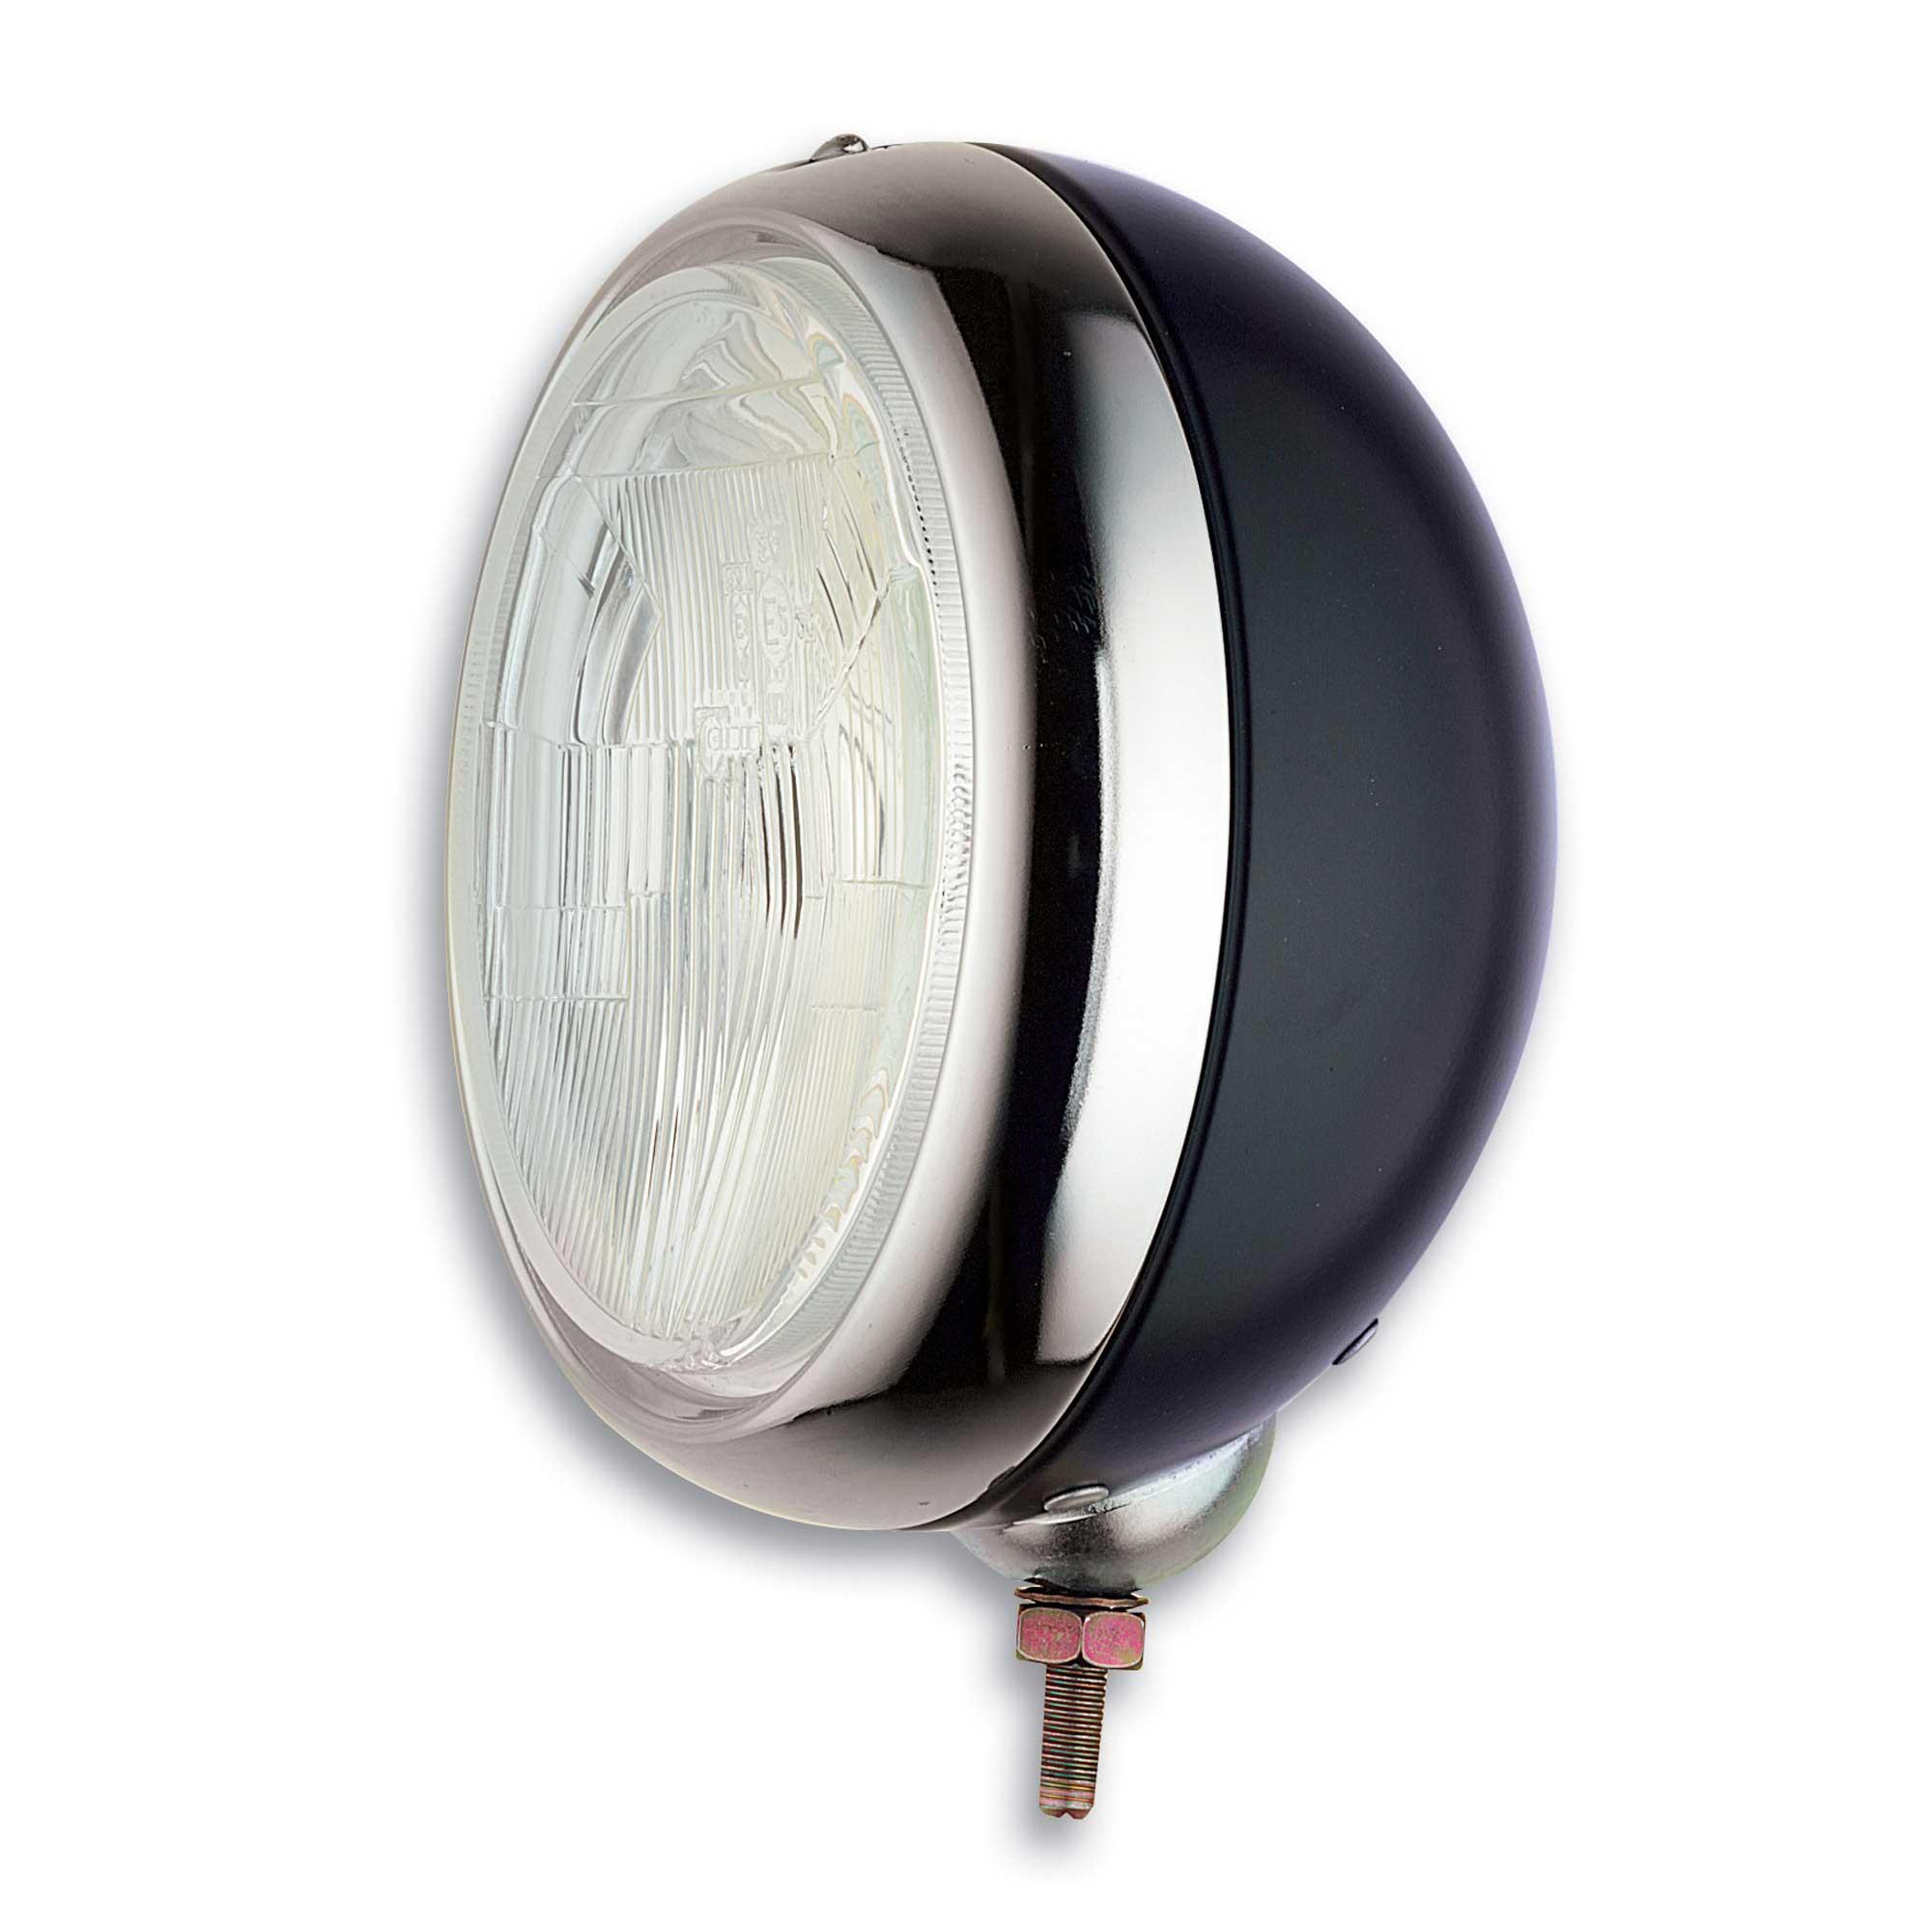 "GENUINE CIBIE OSCAR 7/"" SPOT LIGHT SPOT LAMP DRIVING FOG LIGHT LAMP COVERS CAPS"